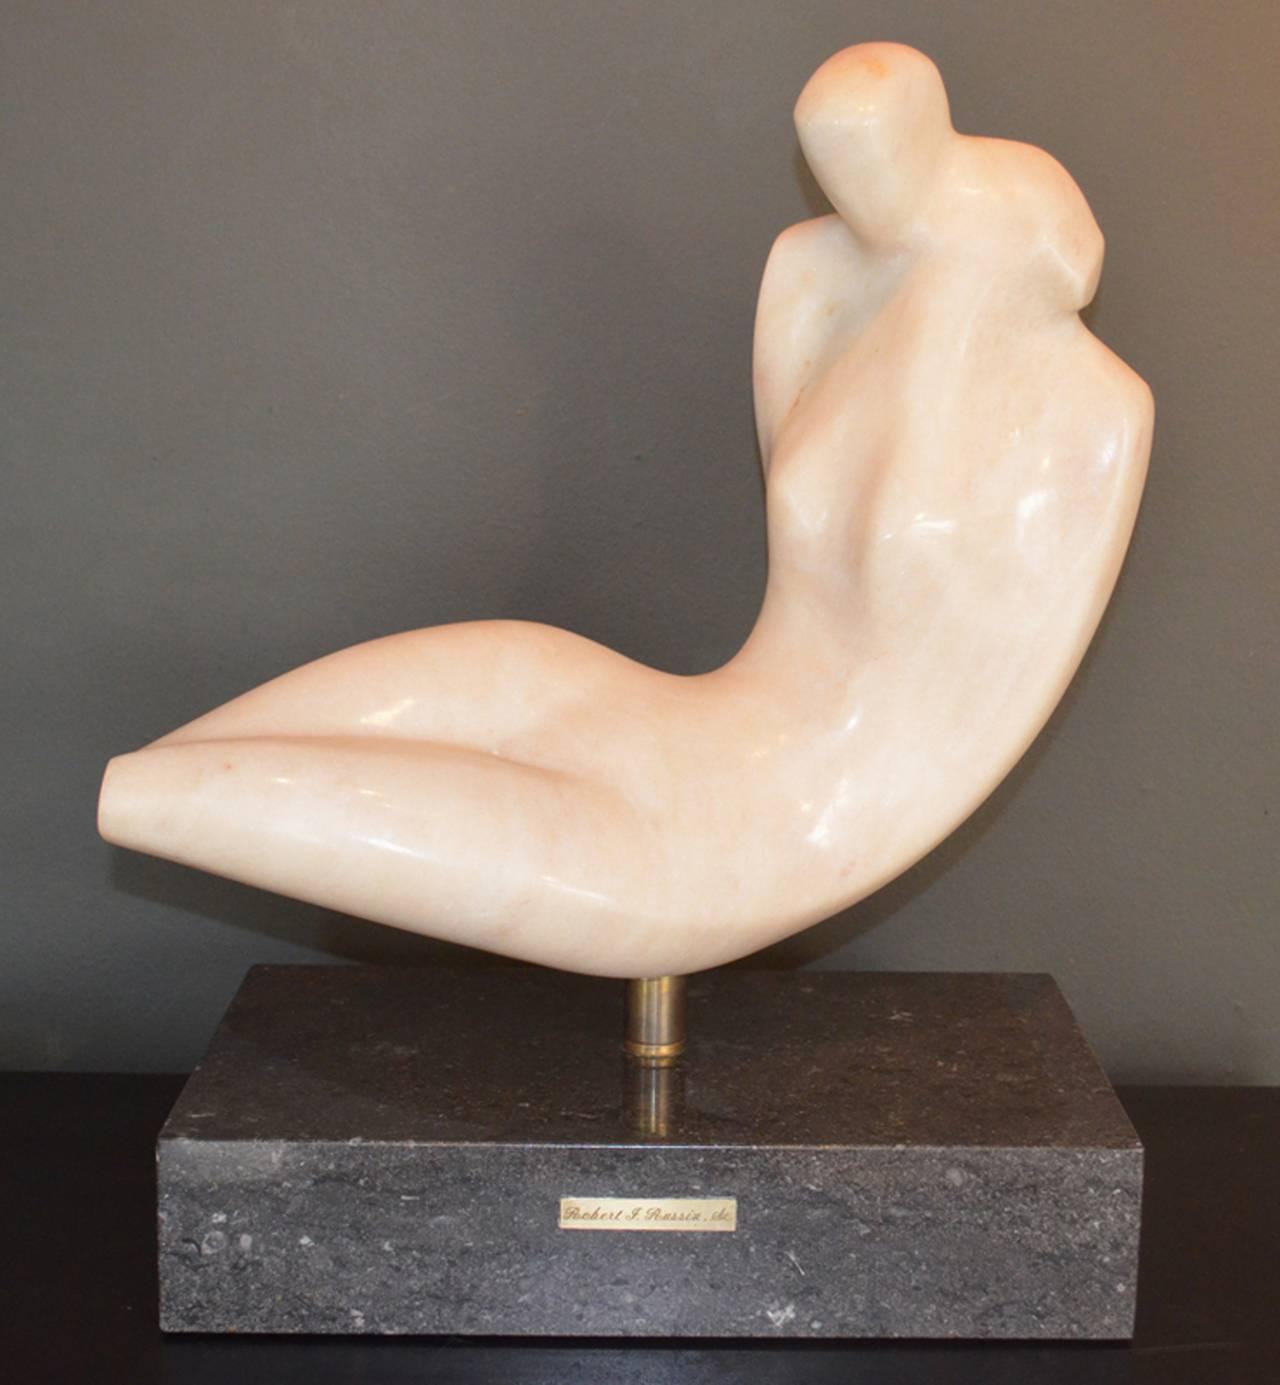 Robert Russin Figurative Sculpture - How Fair is Thy Love